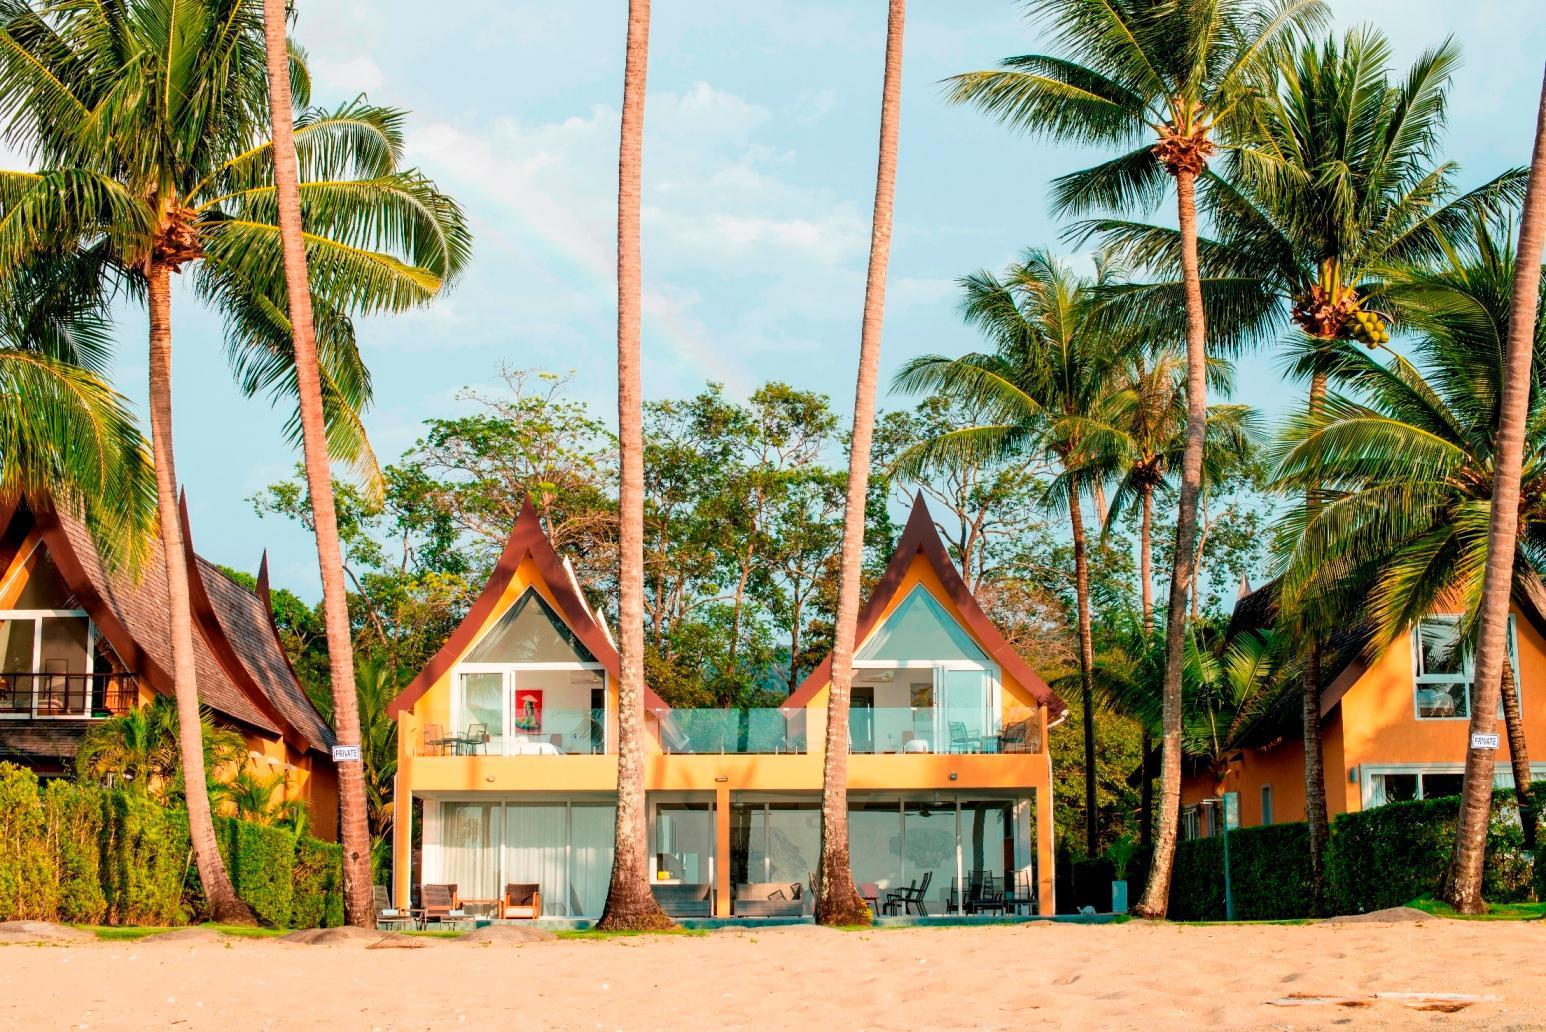 Sunset Emily Villas & Rooms ซันเซ็ต เอมิลี วิลลา แอนด์ รูม